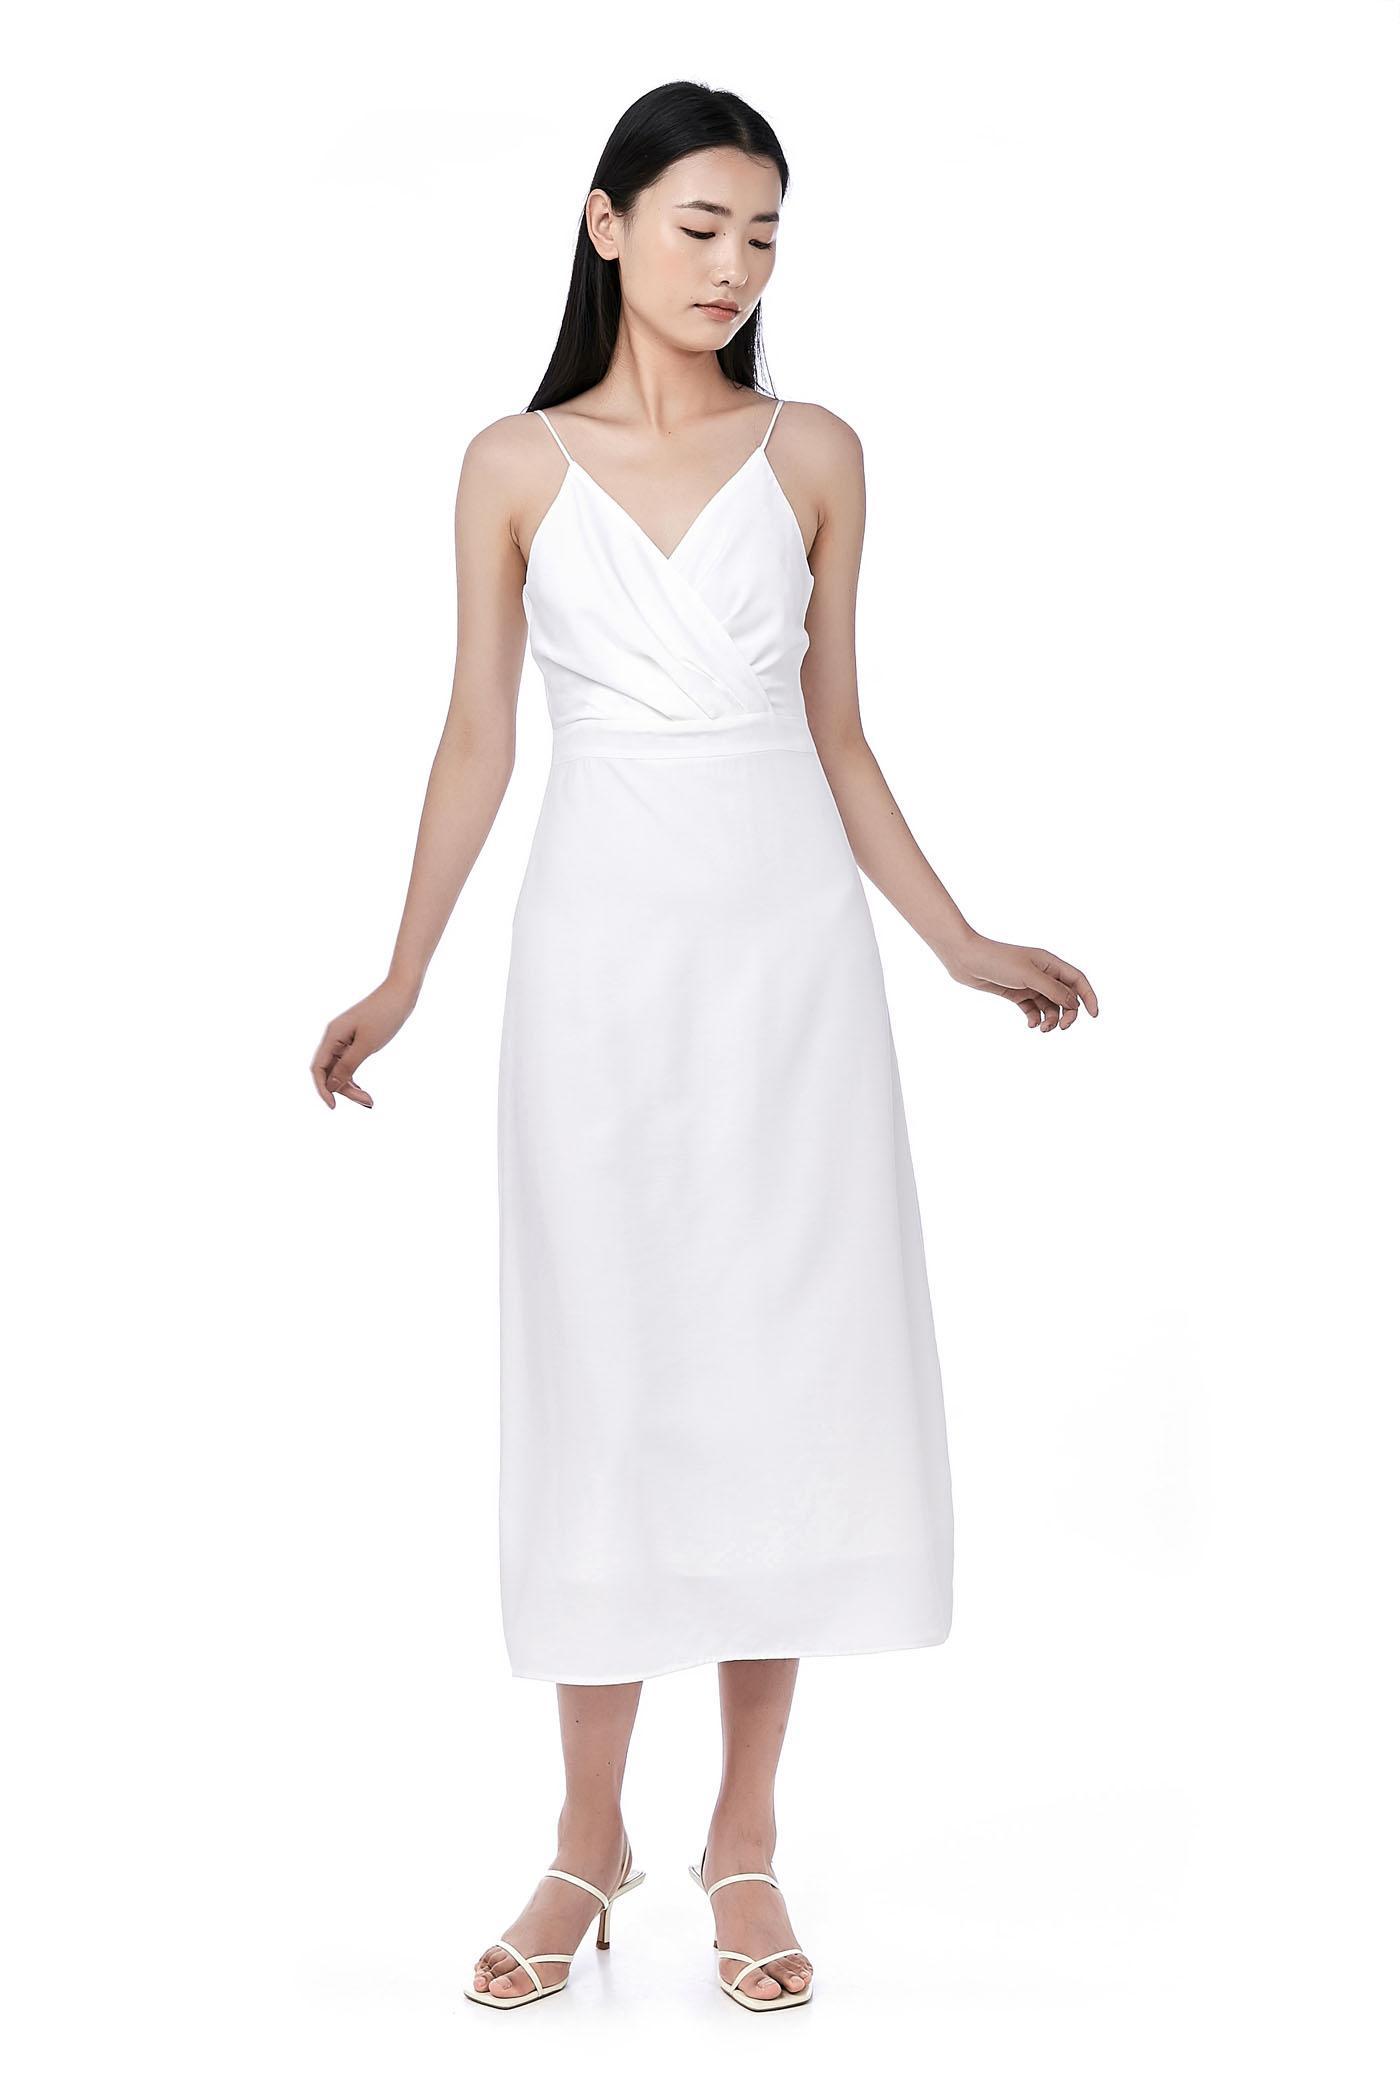 Kaera Overlap Dress